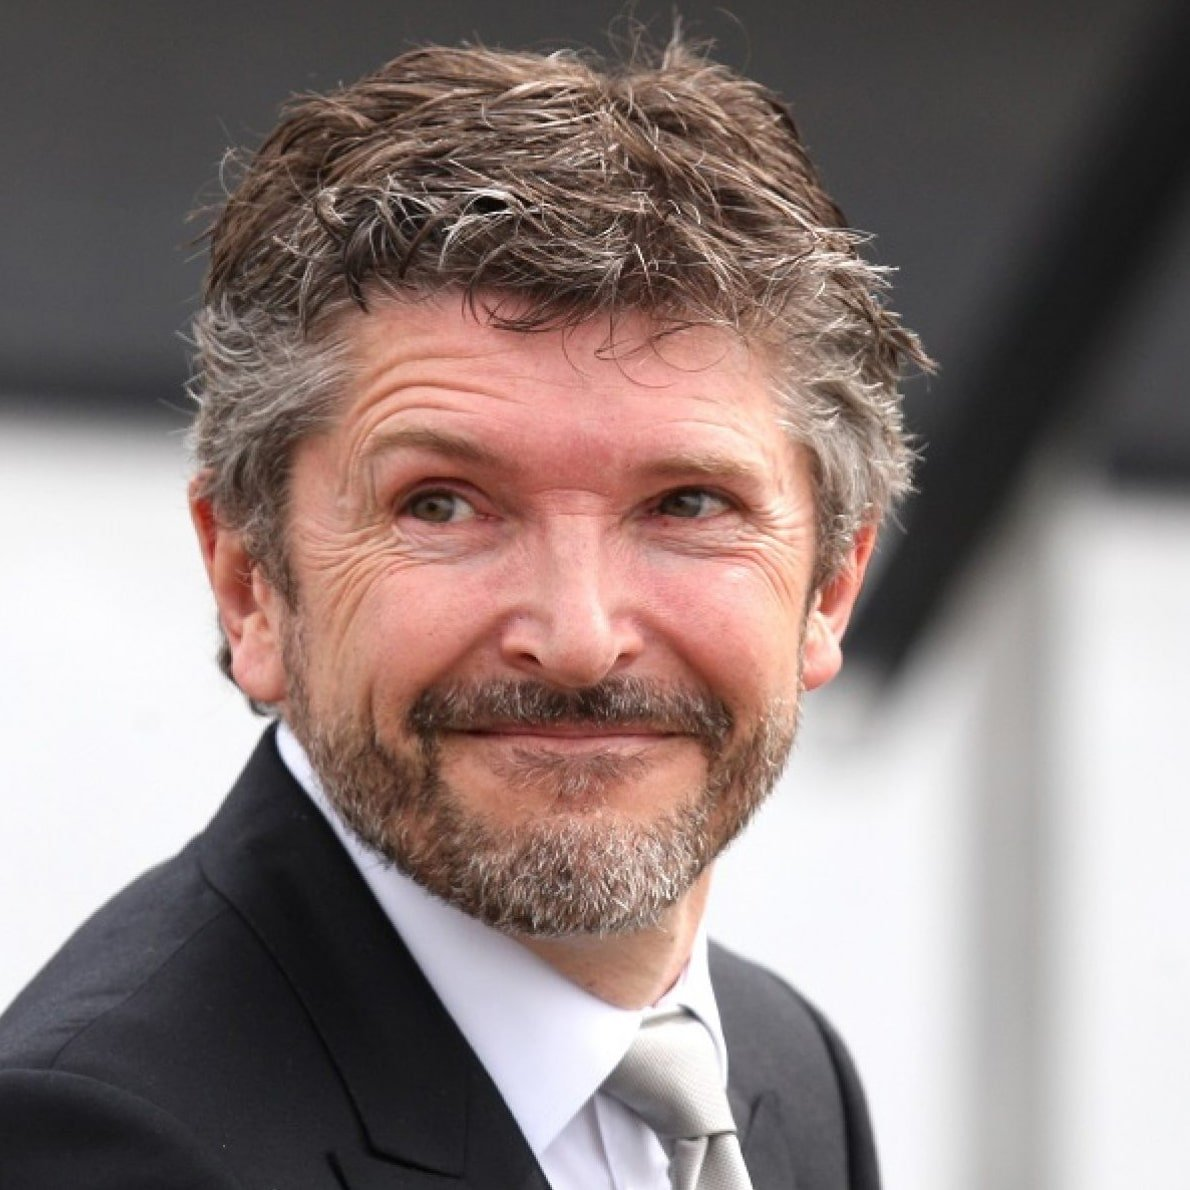 Nick-Fry-Formula-One-motivational-Speaker-Brawn-GP-at-Great-British-Speakers